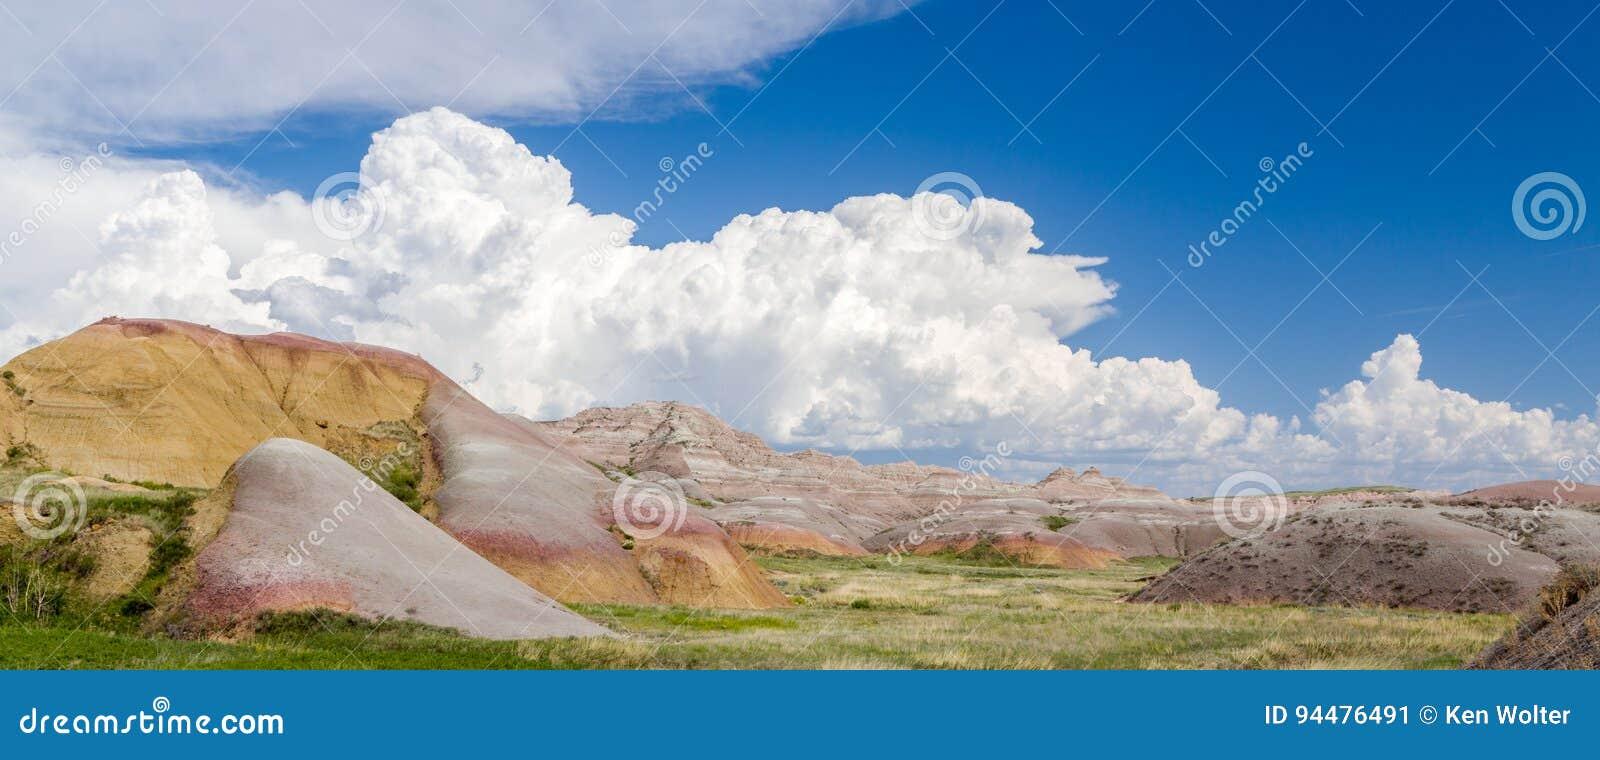 Badlands Nationaal Park Panorma